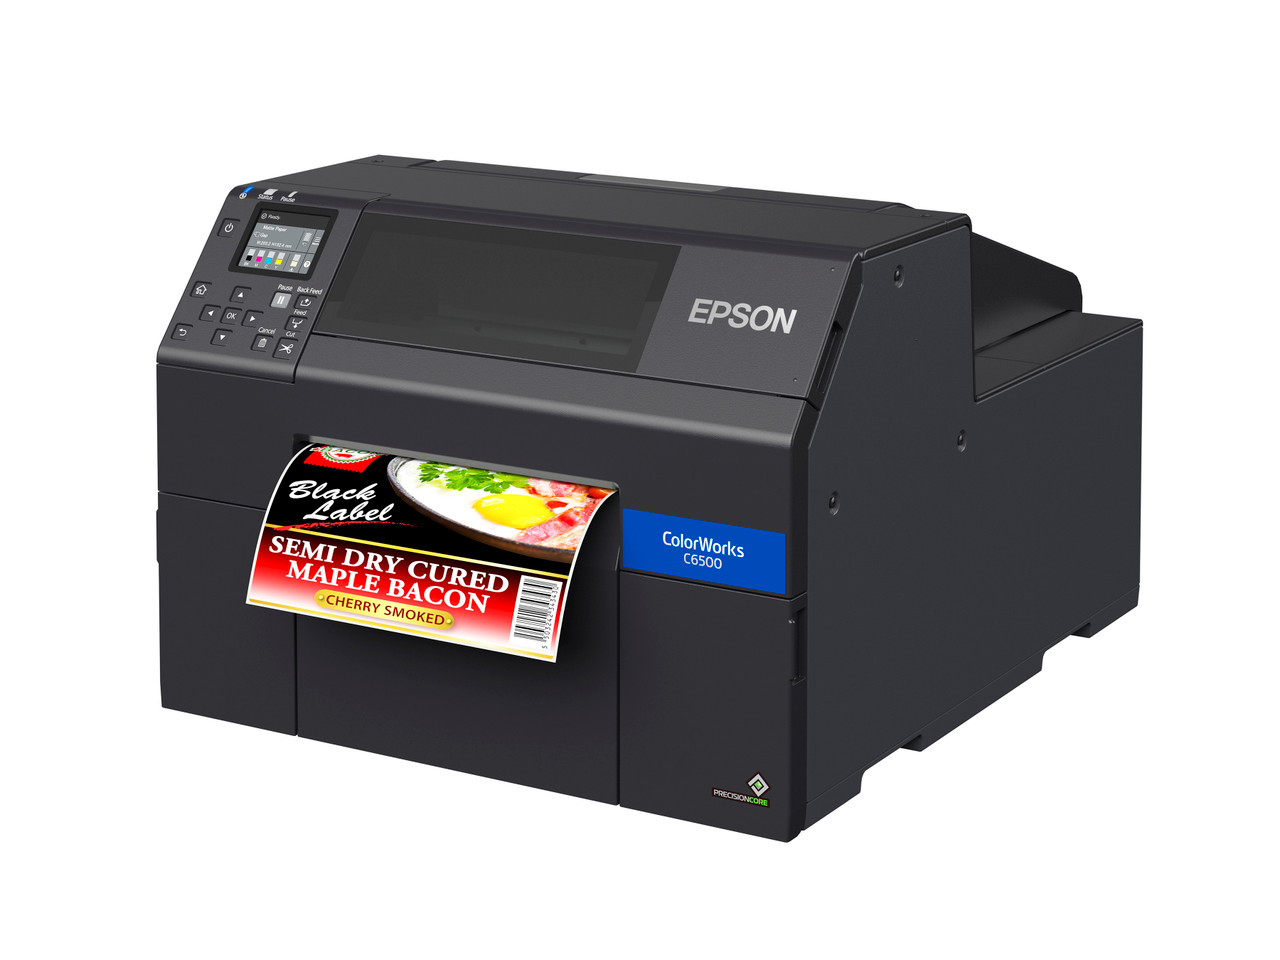 Epson ColorWorks C6500A 8 inch color label printer - Autocutter